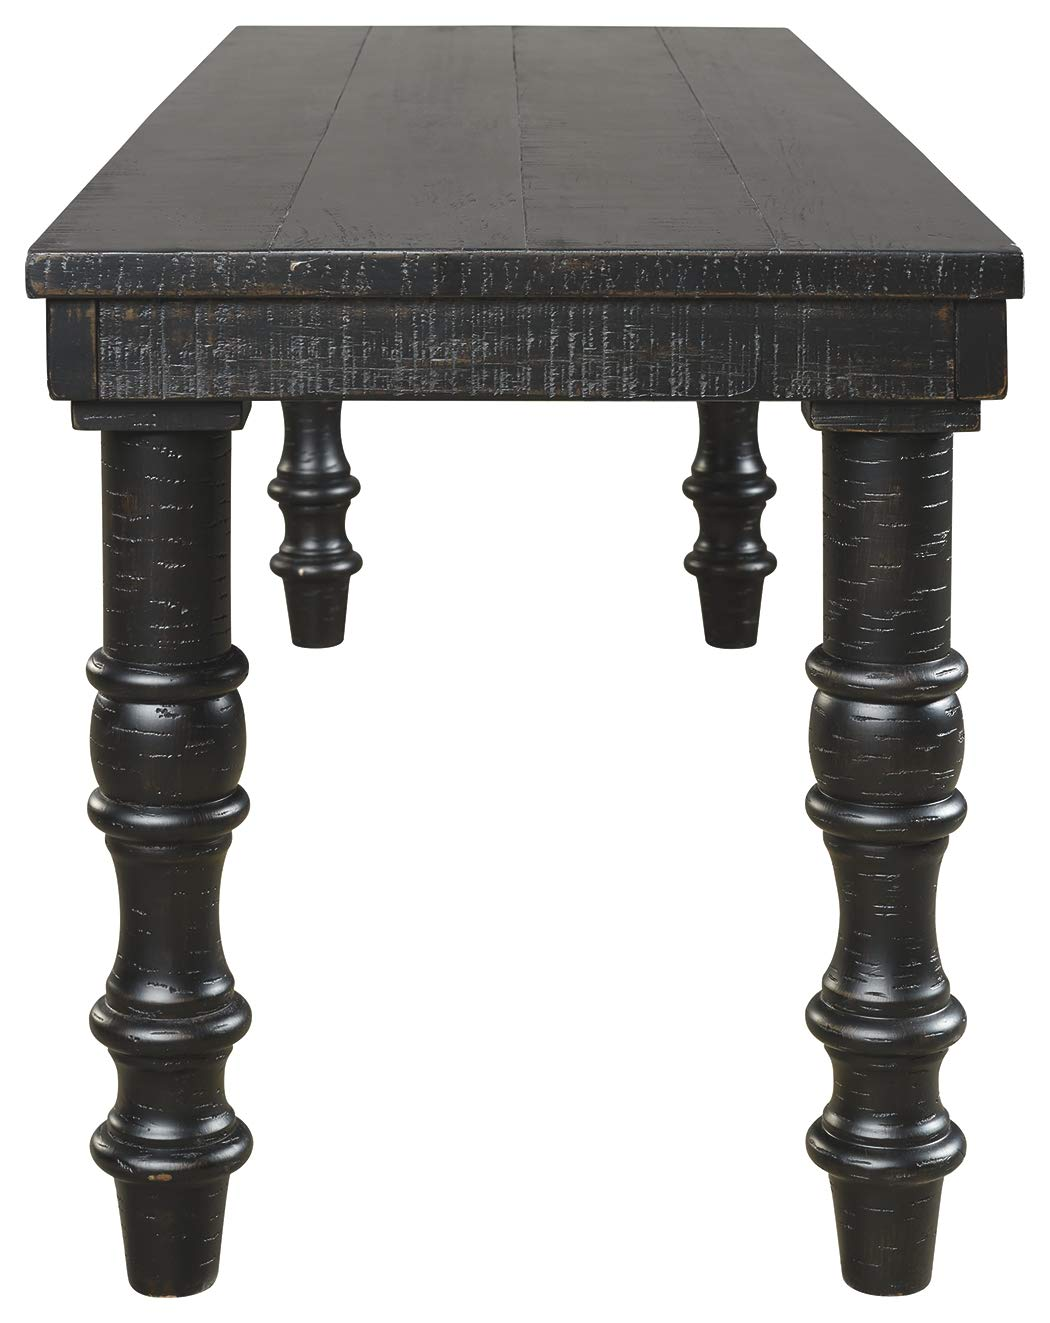 Signature Design by Ashley A3000160 Dannerville Accent Bench, Black by Signature Design by Ashley (Image #4)